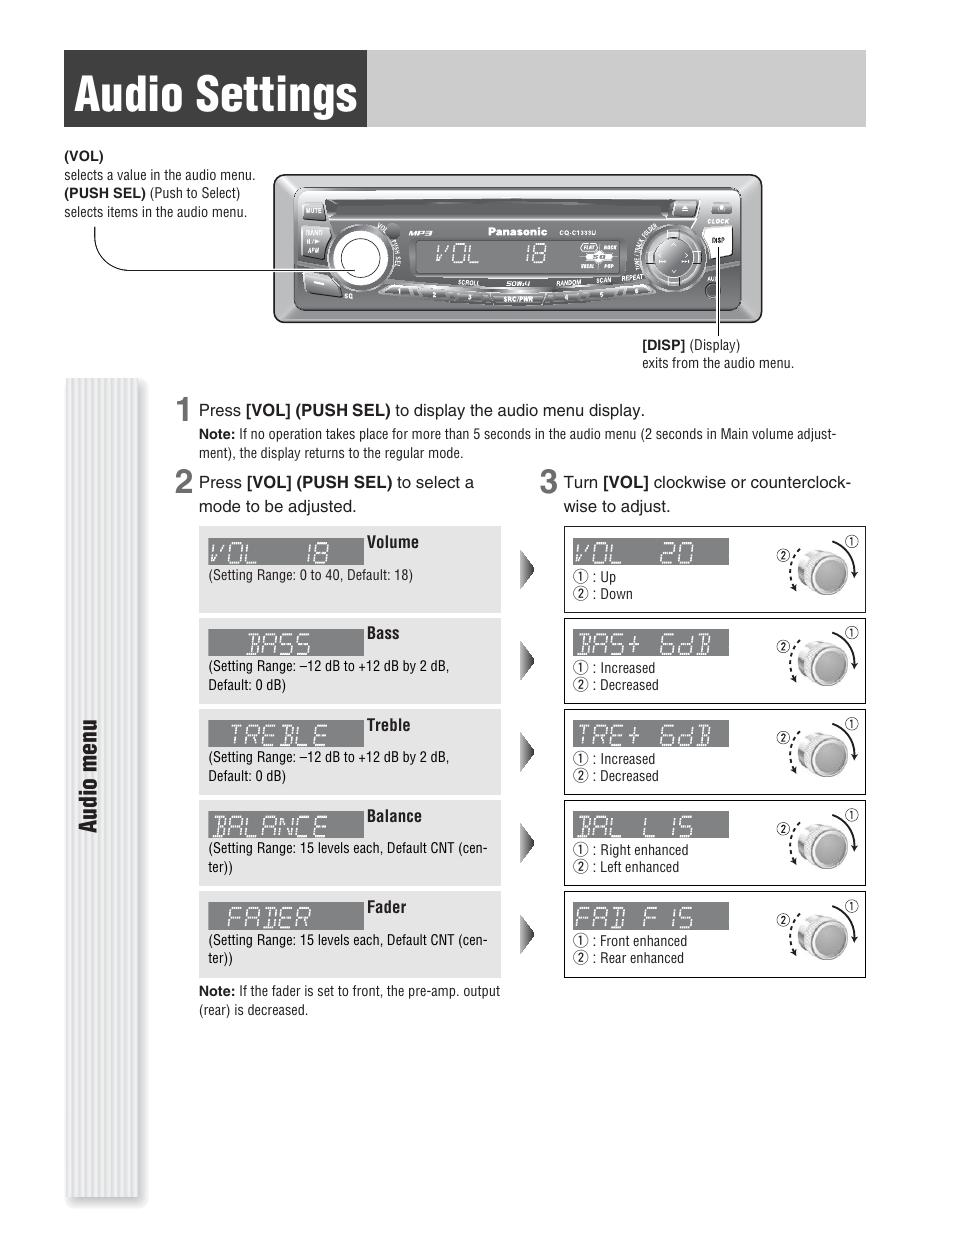 Panasonic Cq C1333u Wiring Diagram Schematics And Diagrams Car Stereo Also Cp134u Audio Settings Menu User Manual Page Jvc